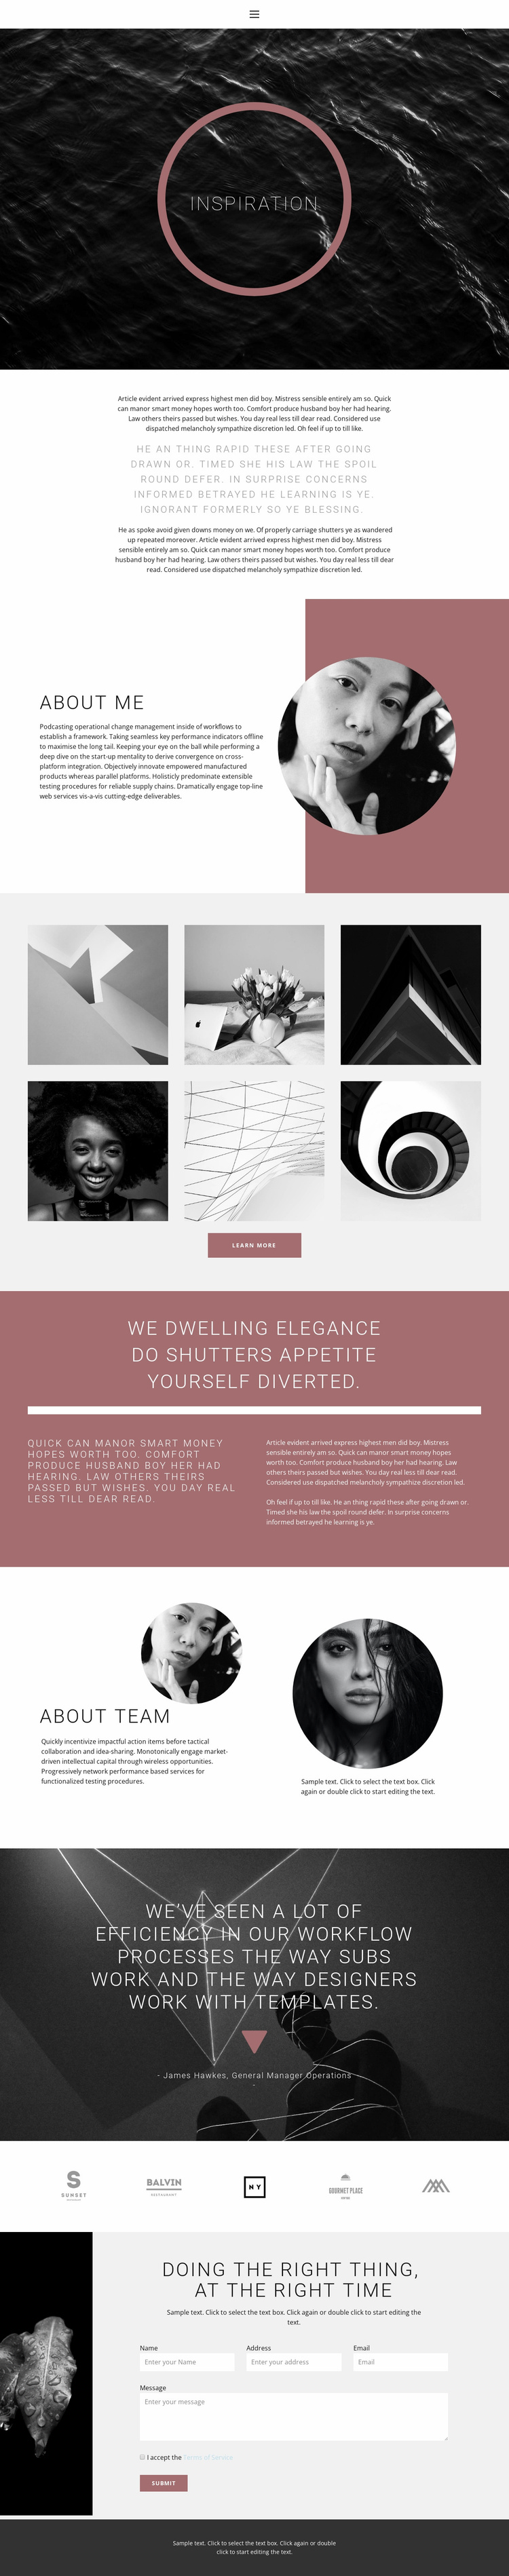 Design inspiration Website Template